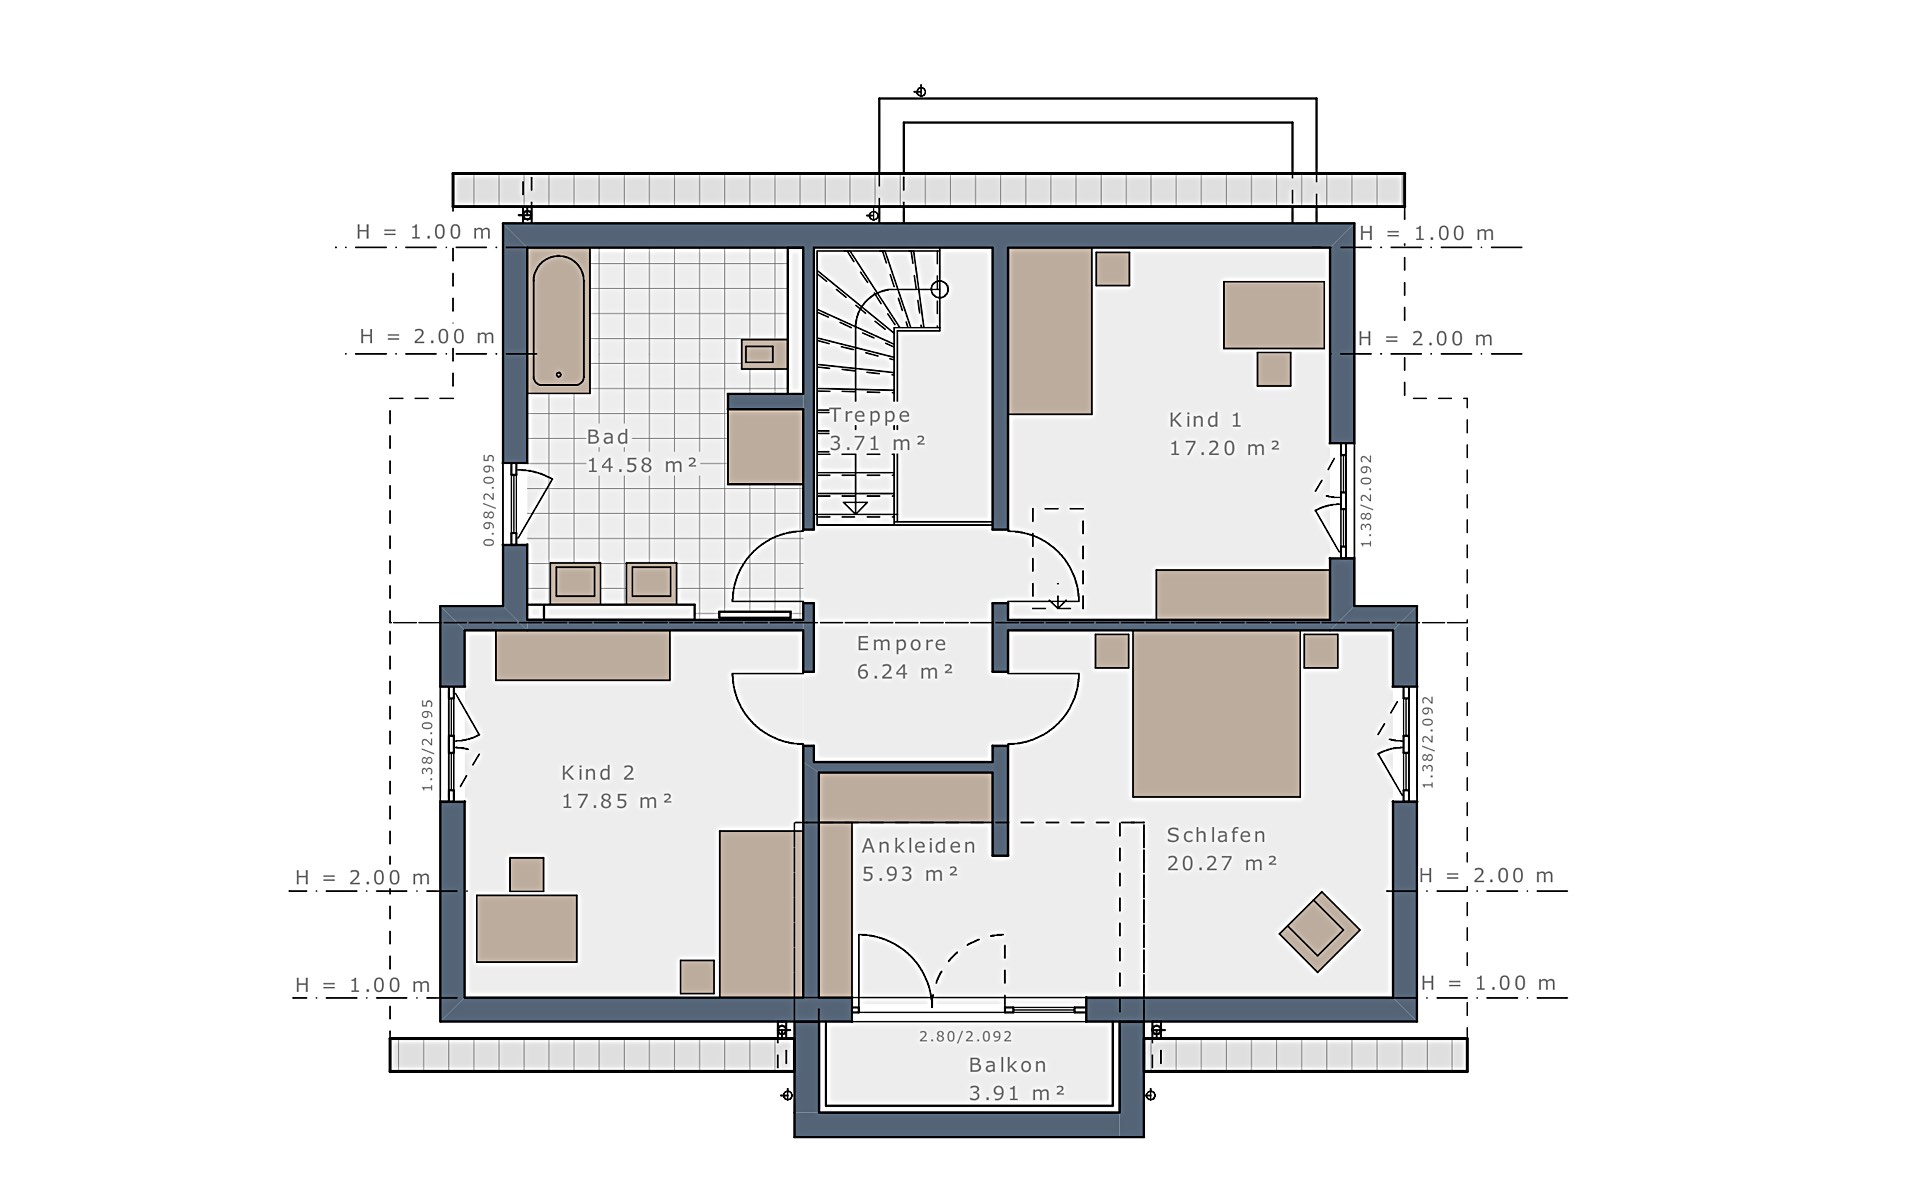 Dachgeschoss Selection-E-175 E3 von Schwabenhaus GmbH & Co. KG